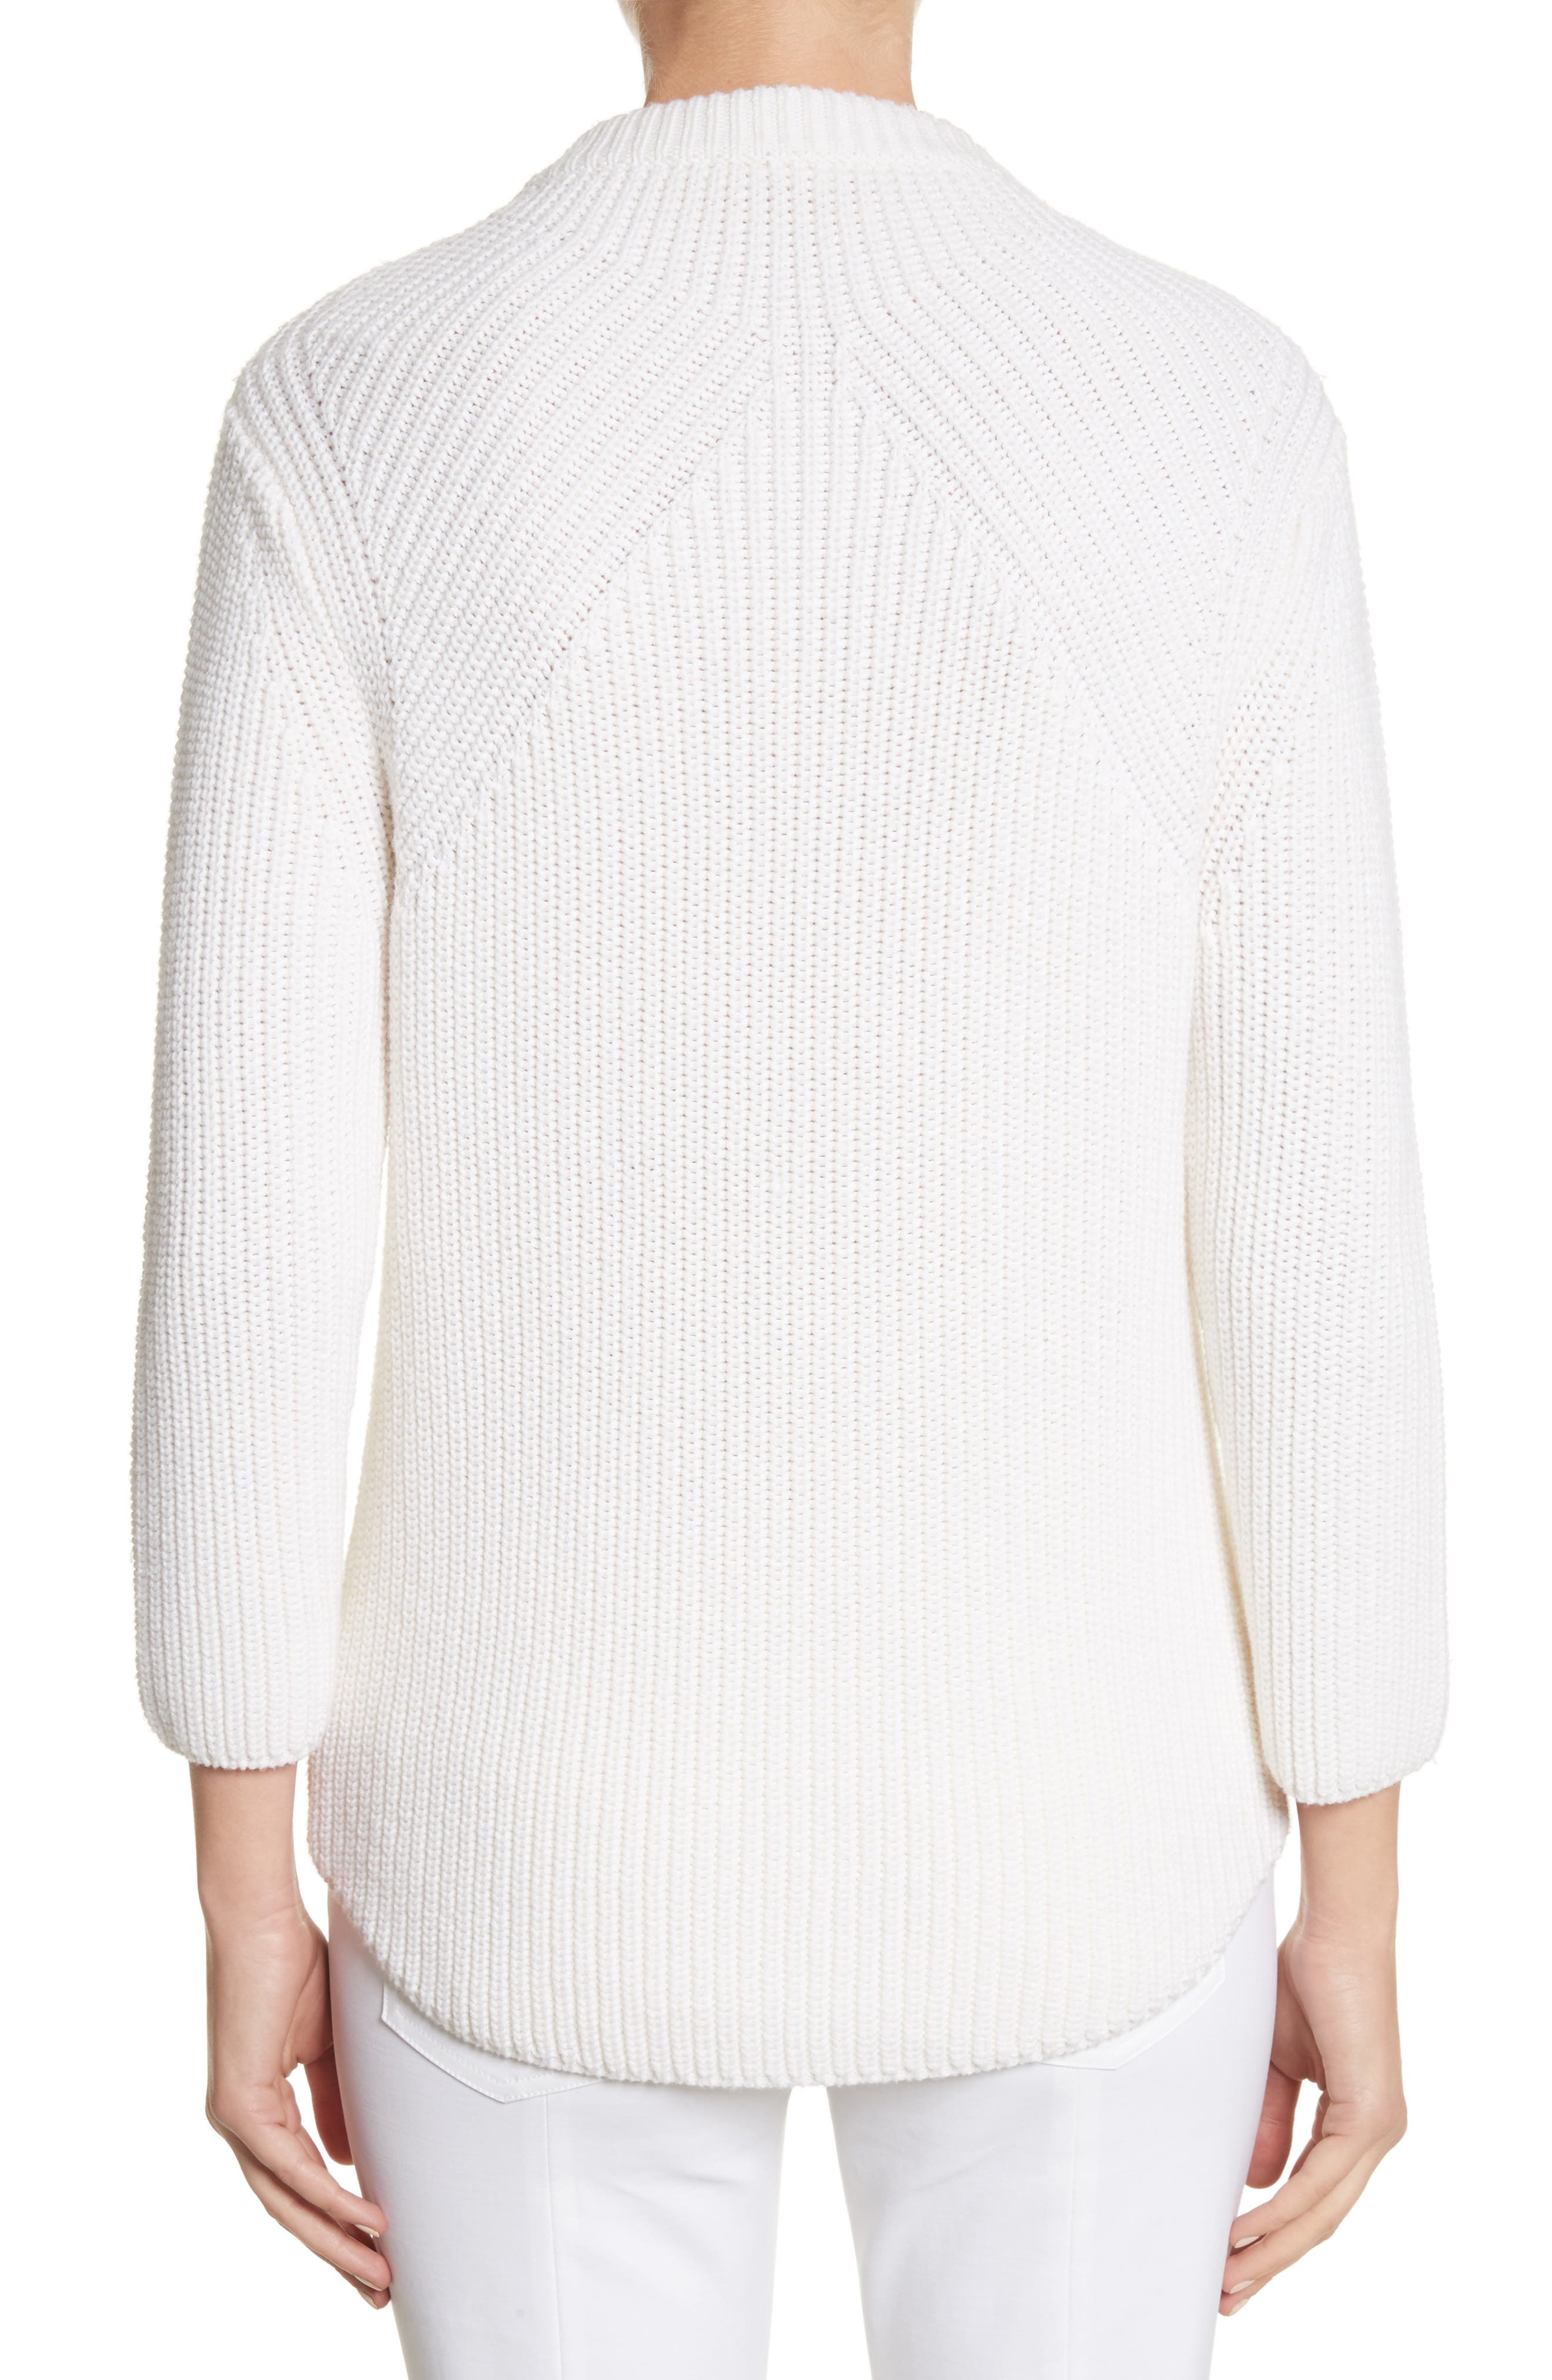 Alternate Image 2  - Michael Kors Merino Wool & Cotton Pullover